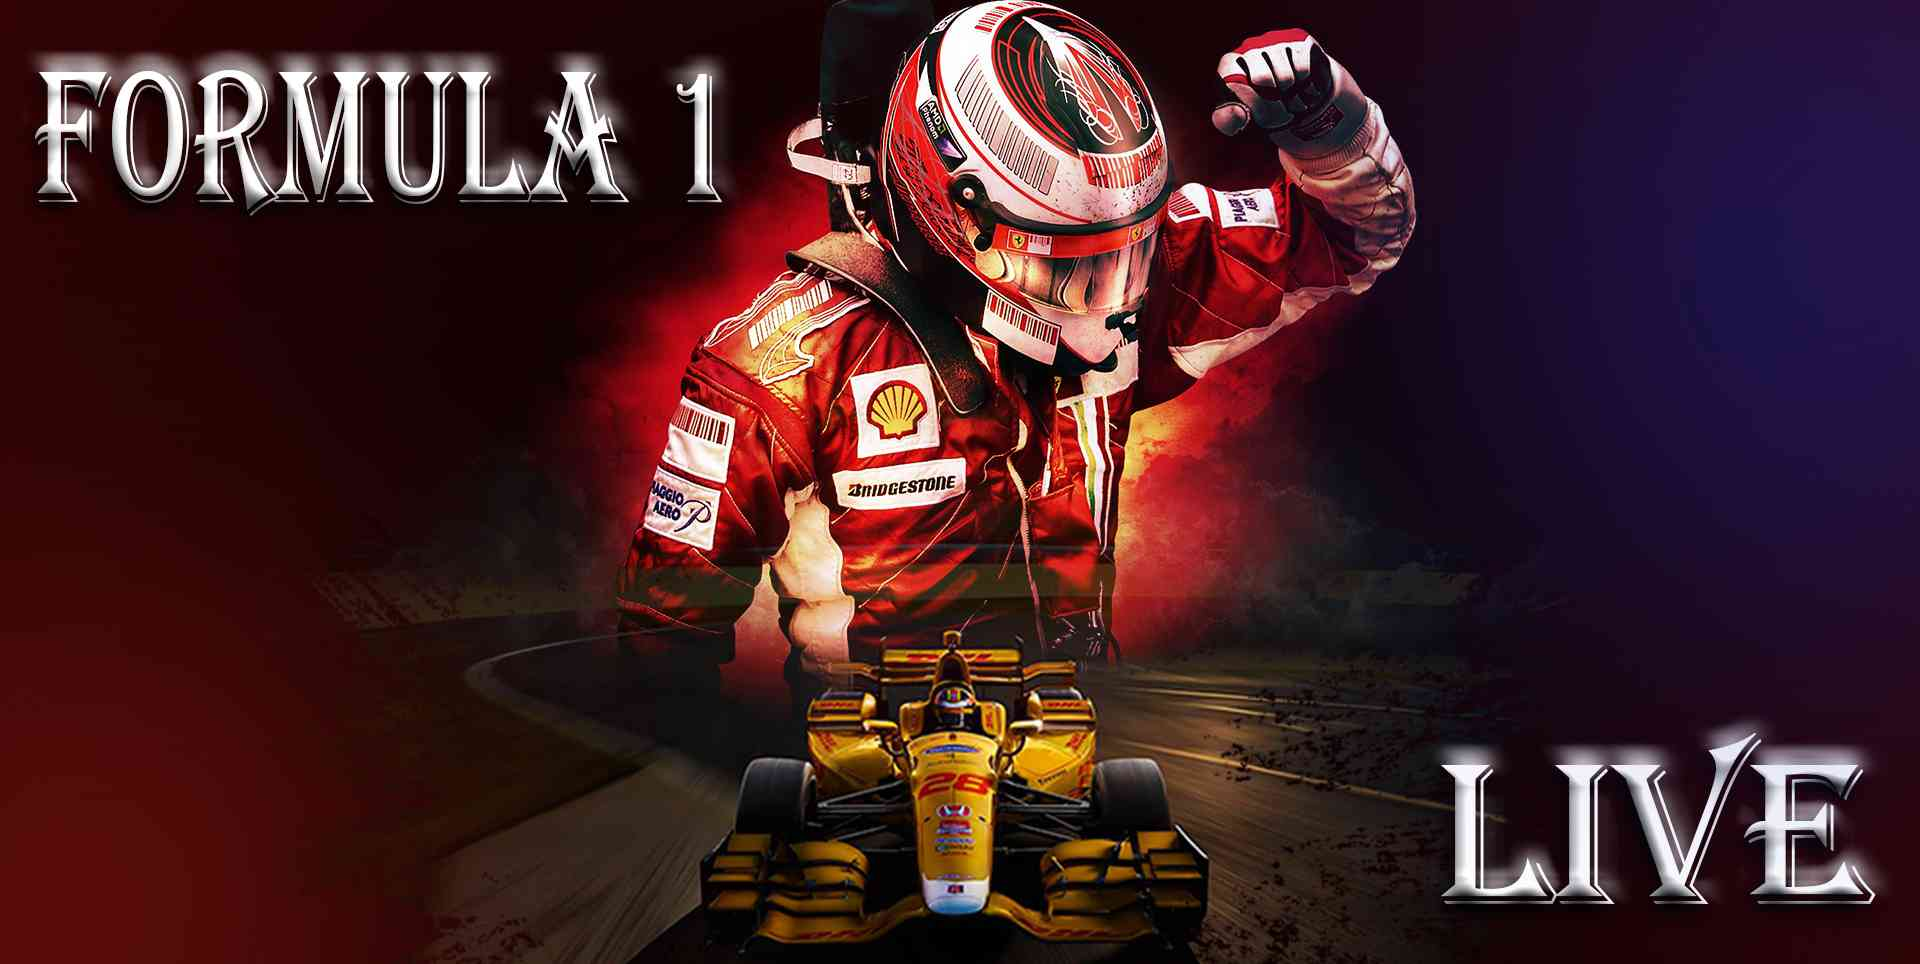 Live F3 European Championship at Silverstone 2015 Stream